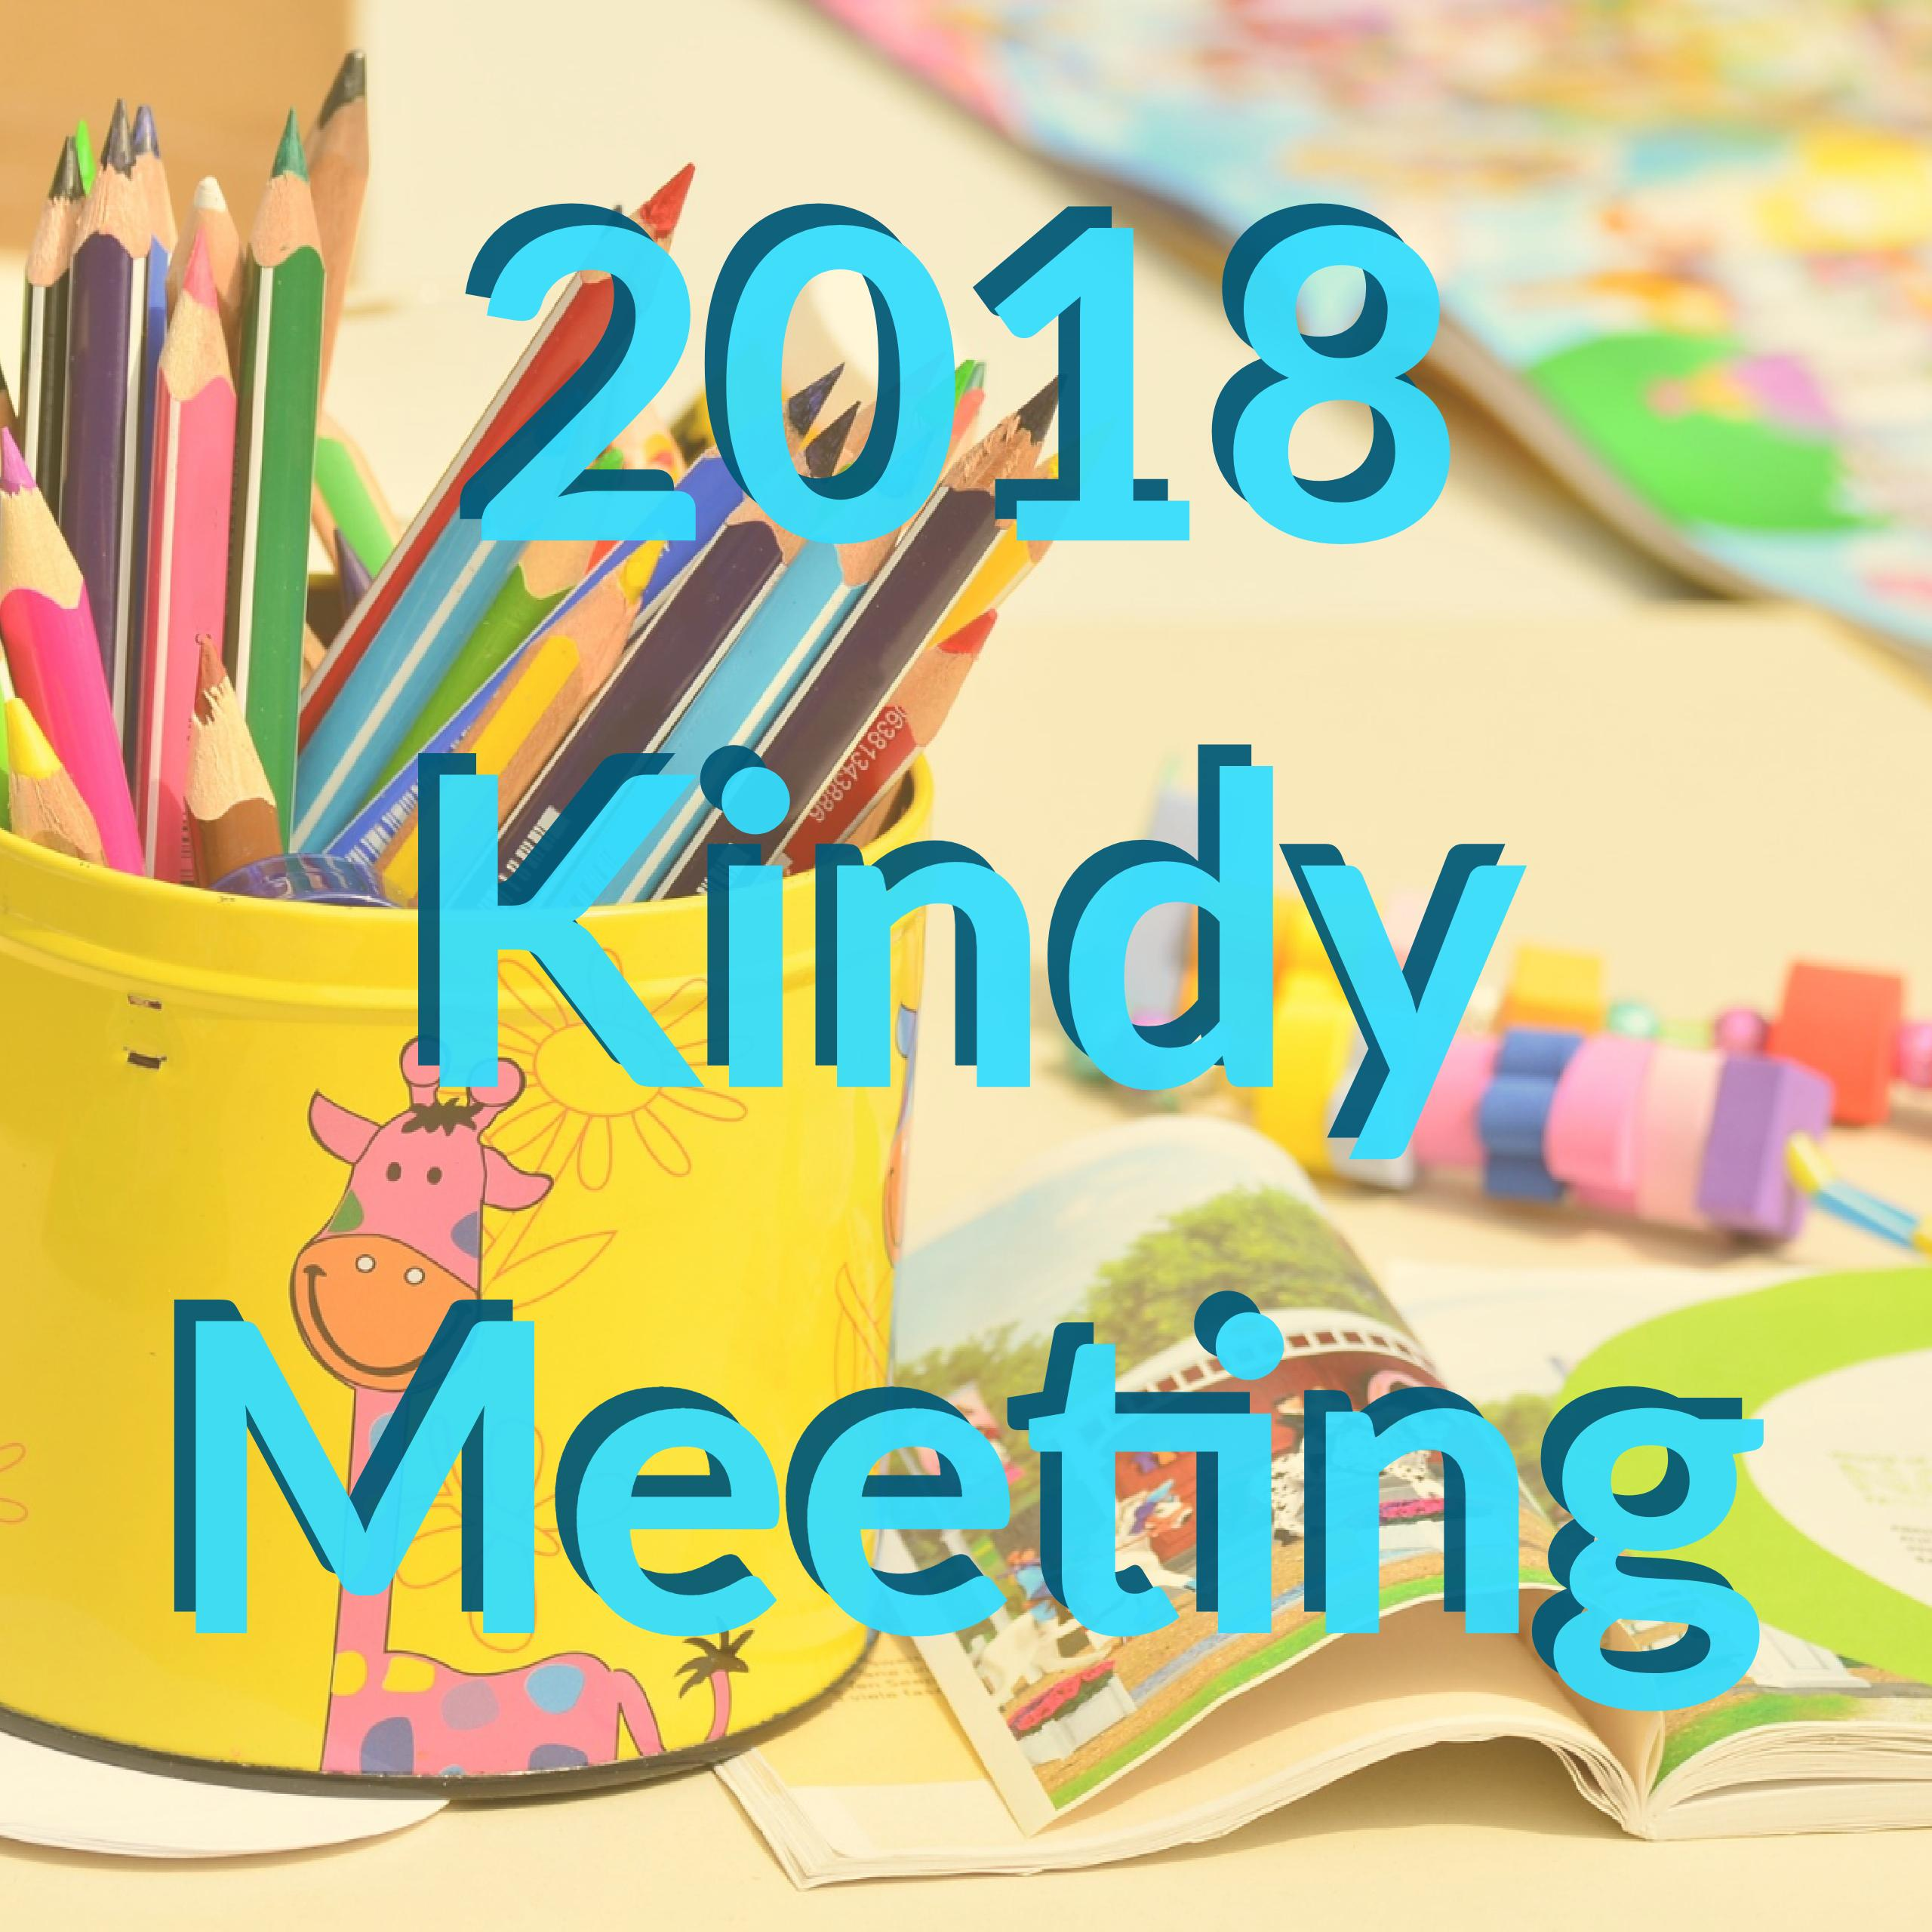 2018 Kindy Meeting